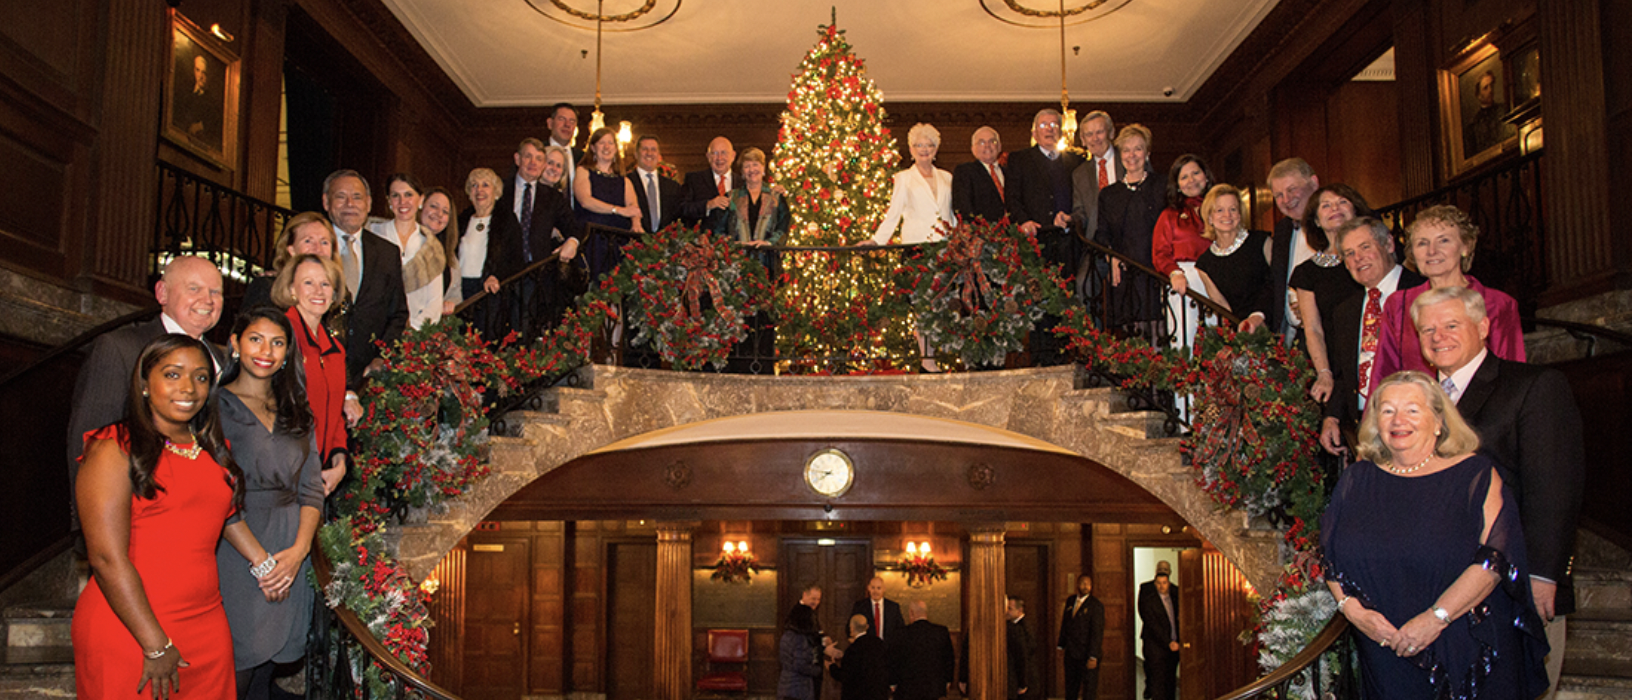 1927 Society Christmas Reception